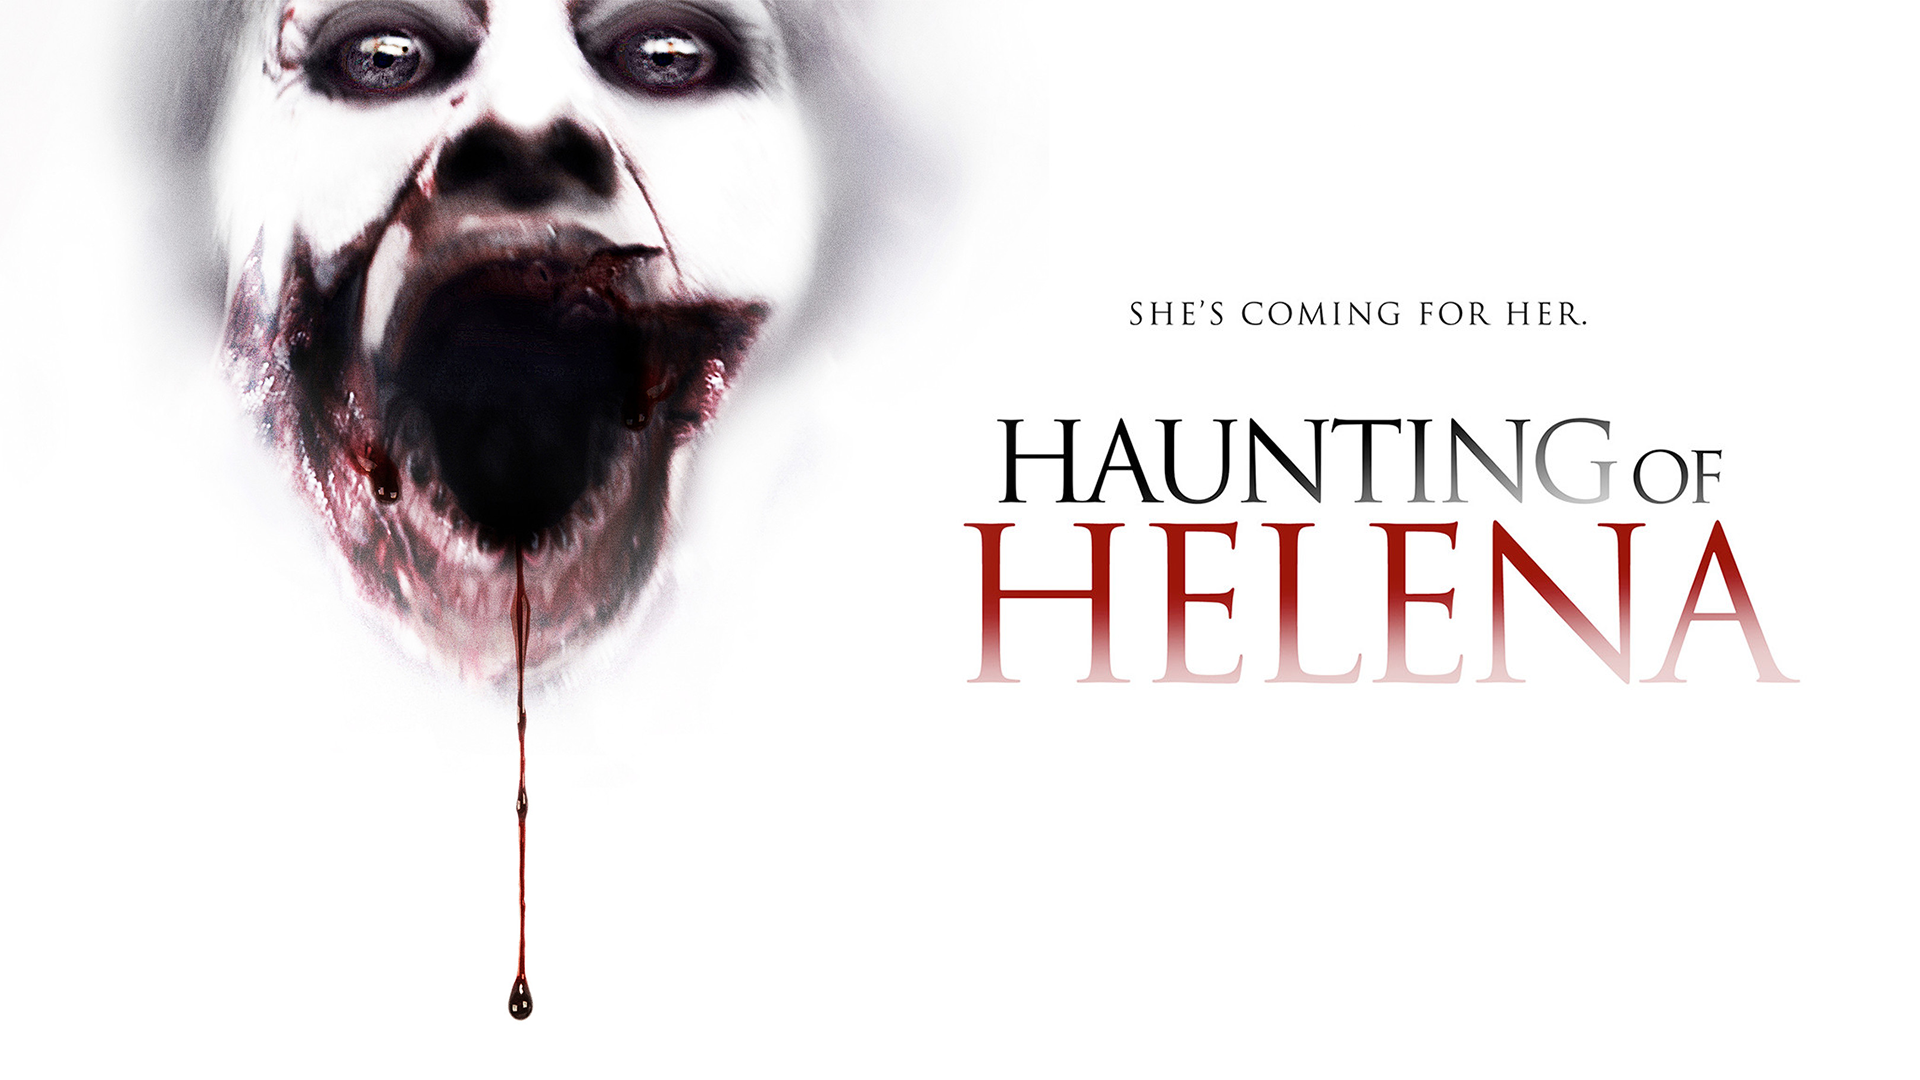 Haunting of Helena